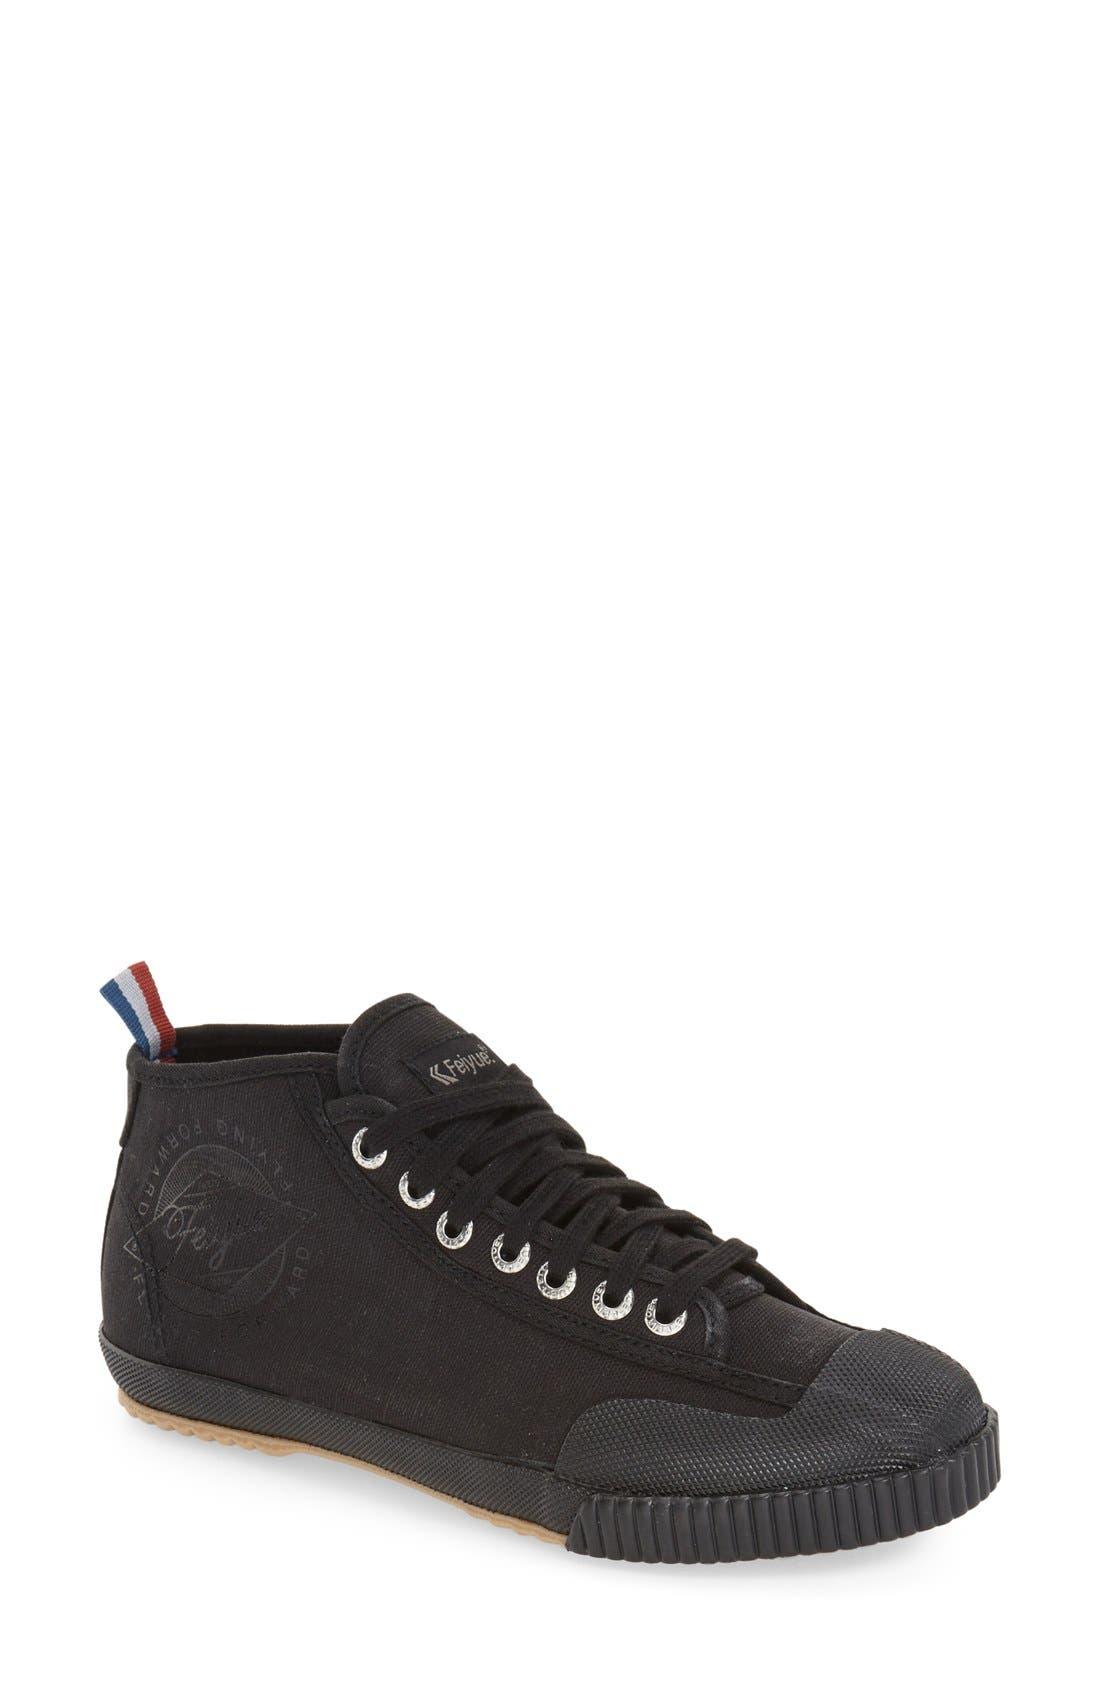 FEIYUE. 'Fe Hi Vintage Classic' Sneaker